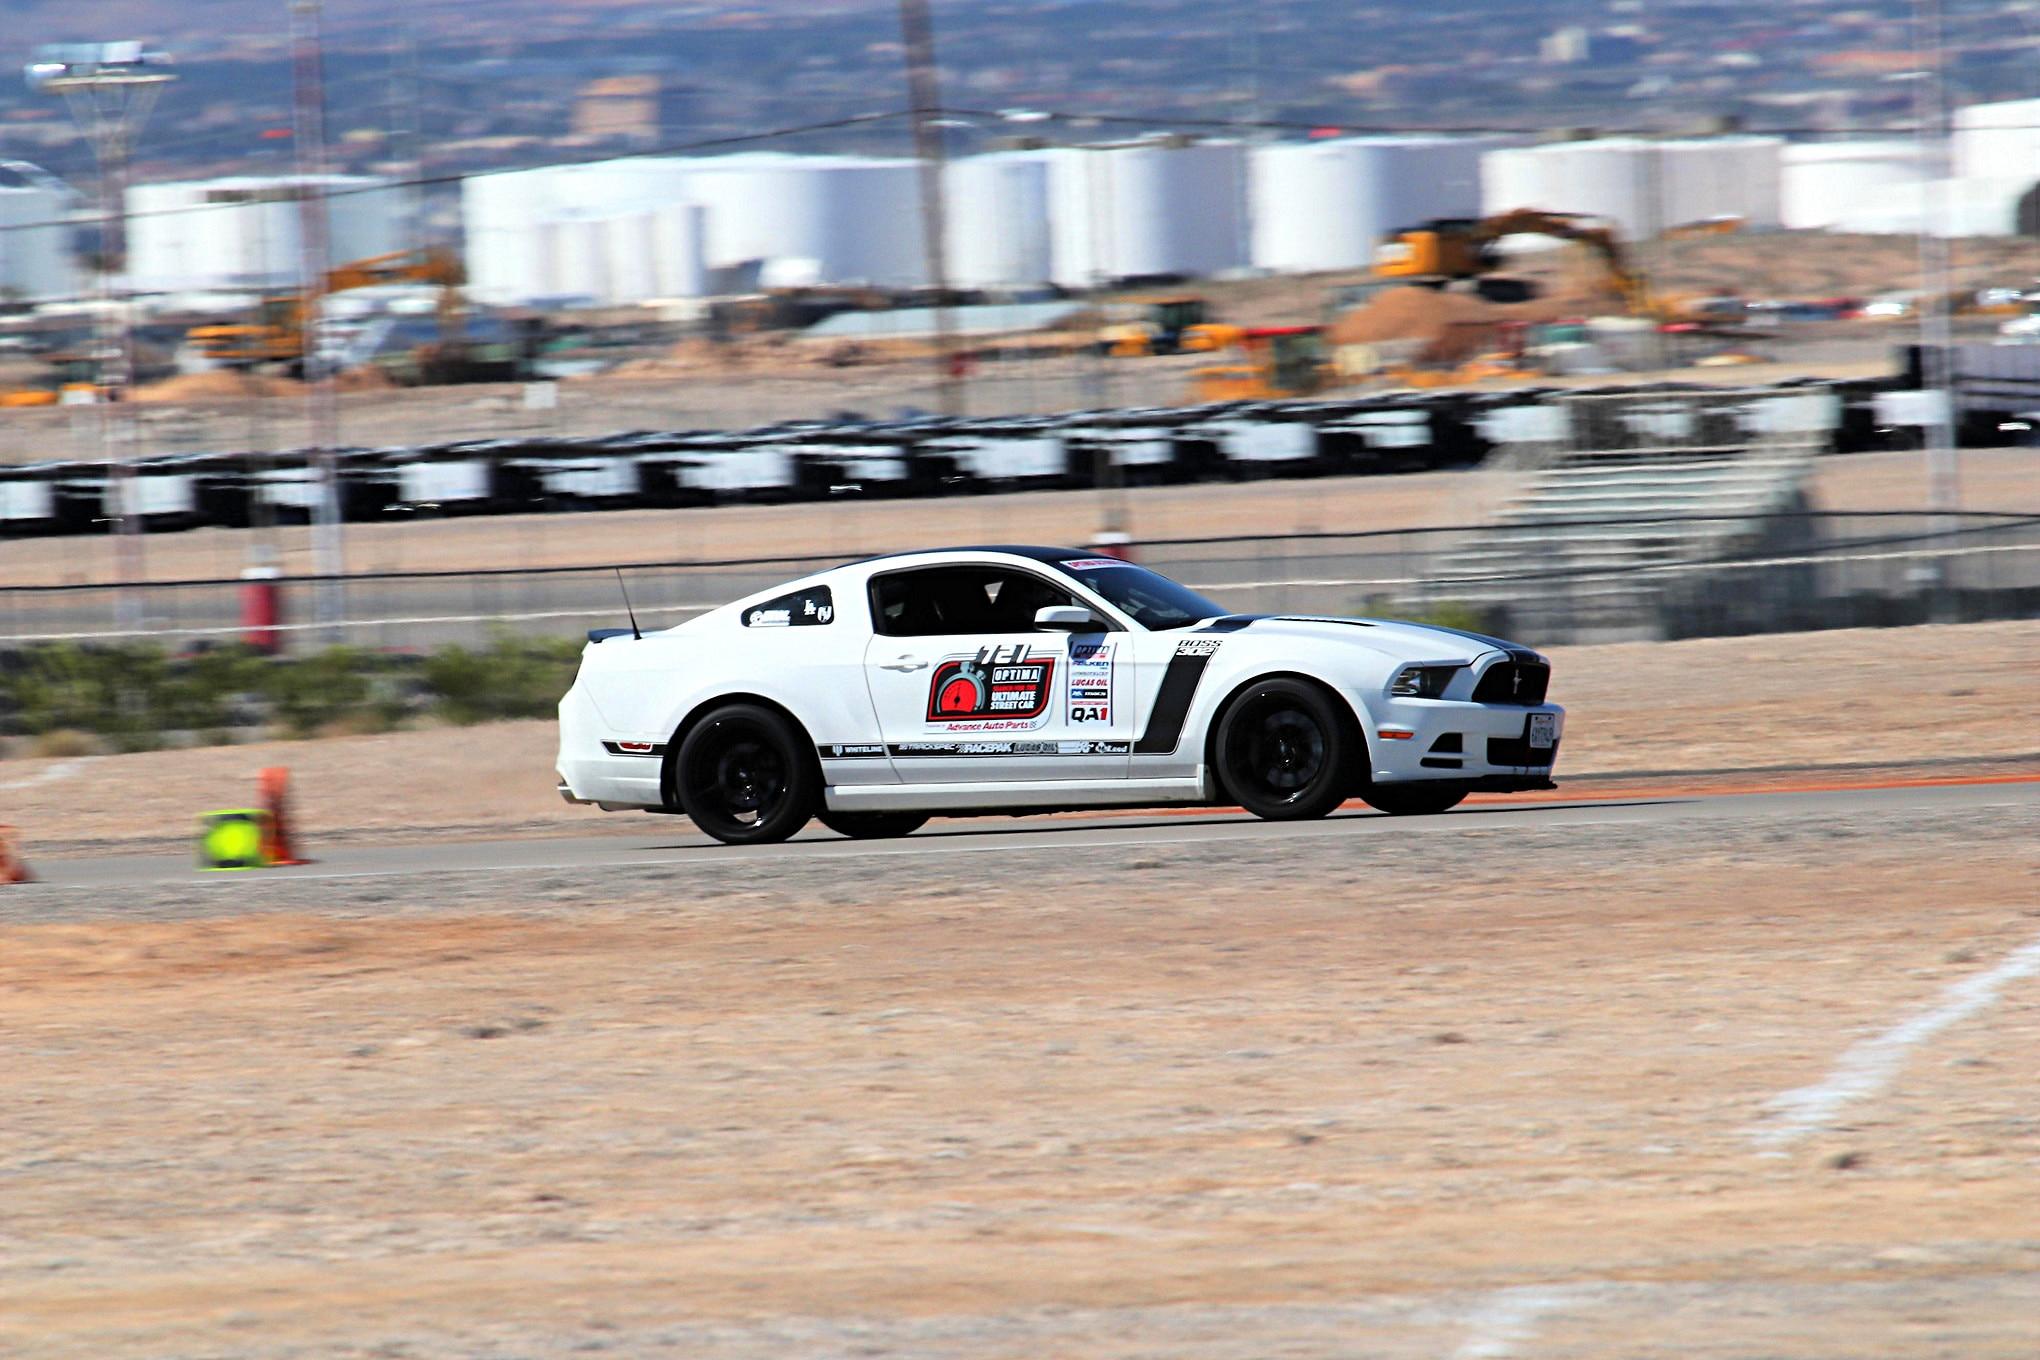 MMFF Nasario Birrueta 2013 Ford Mustang DriveOPTIMA LVMS 2019  119